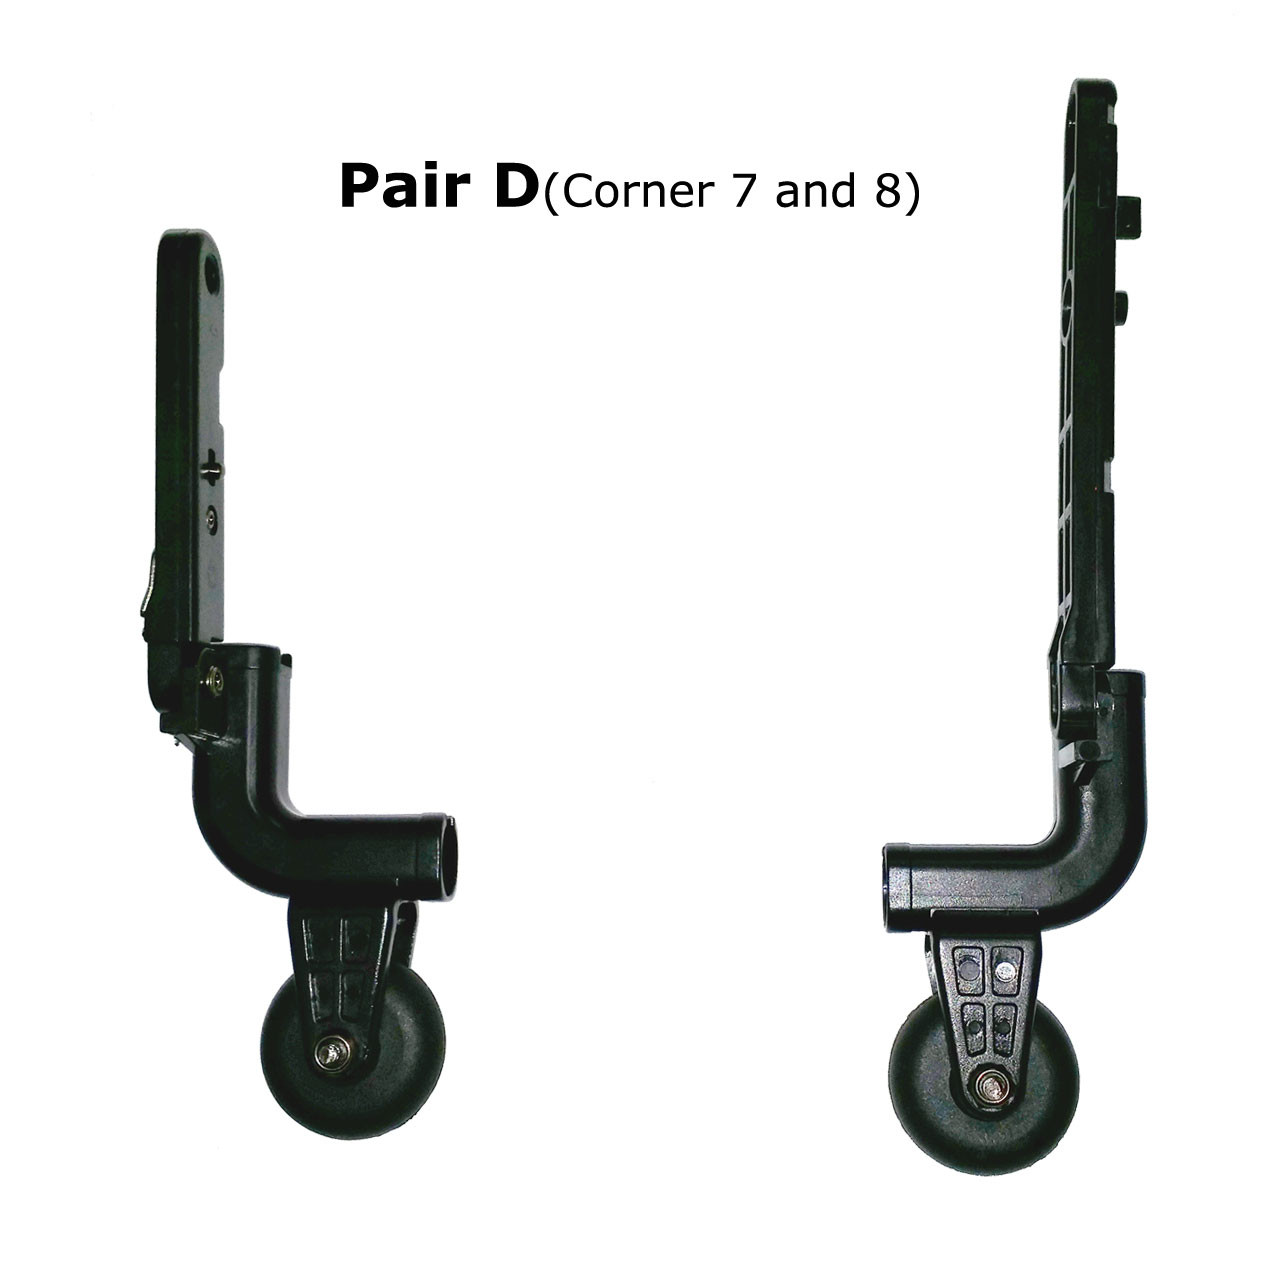 "8"" Width / Pair D (Corner 7 and 8)"